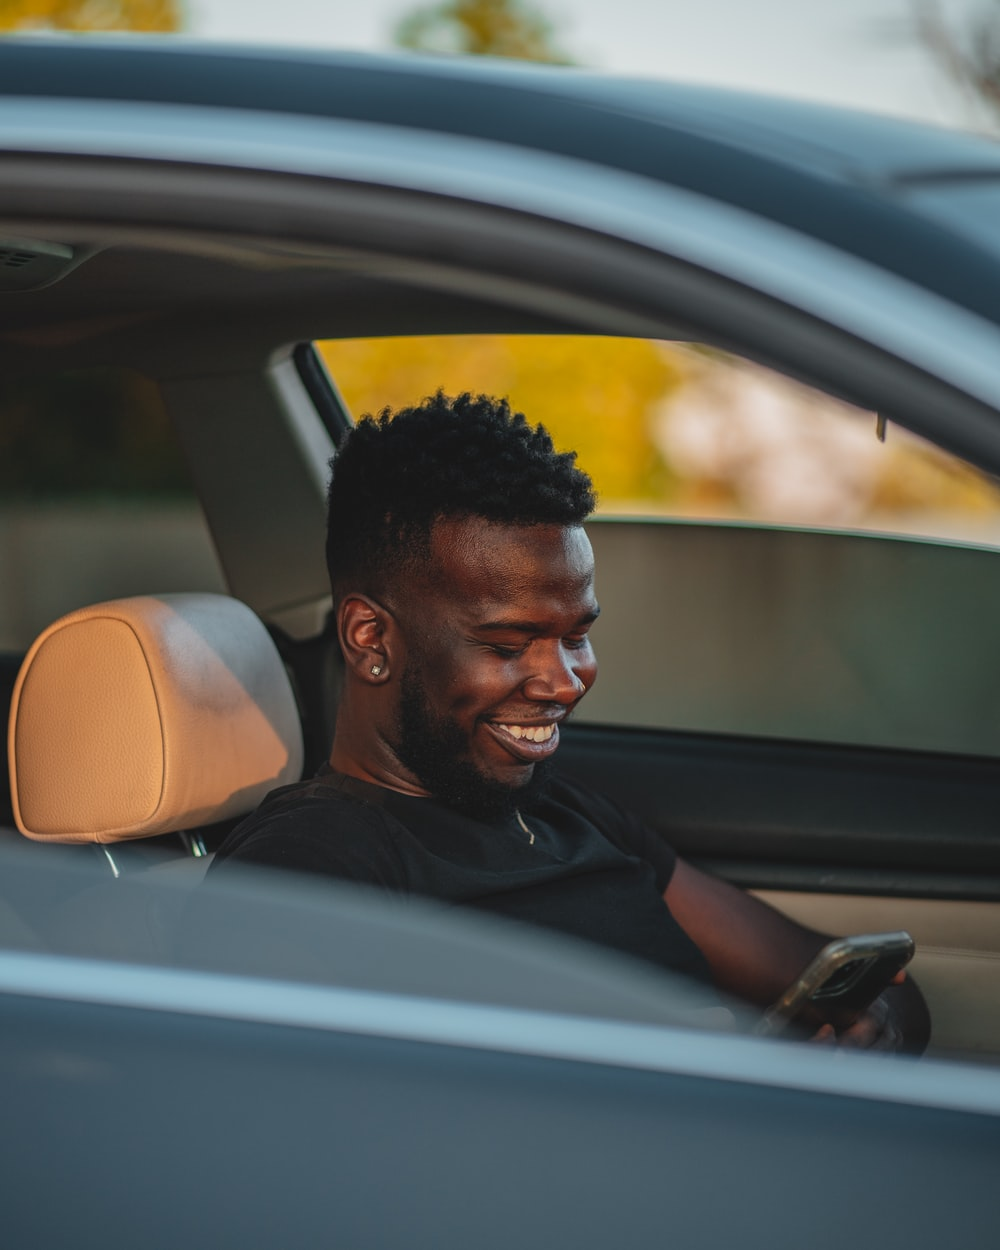 man in black shirt sitting inside car